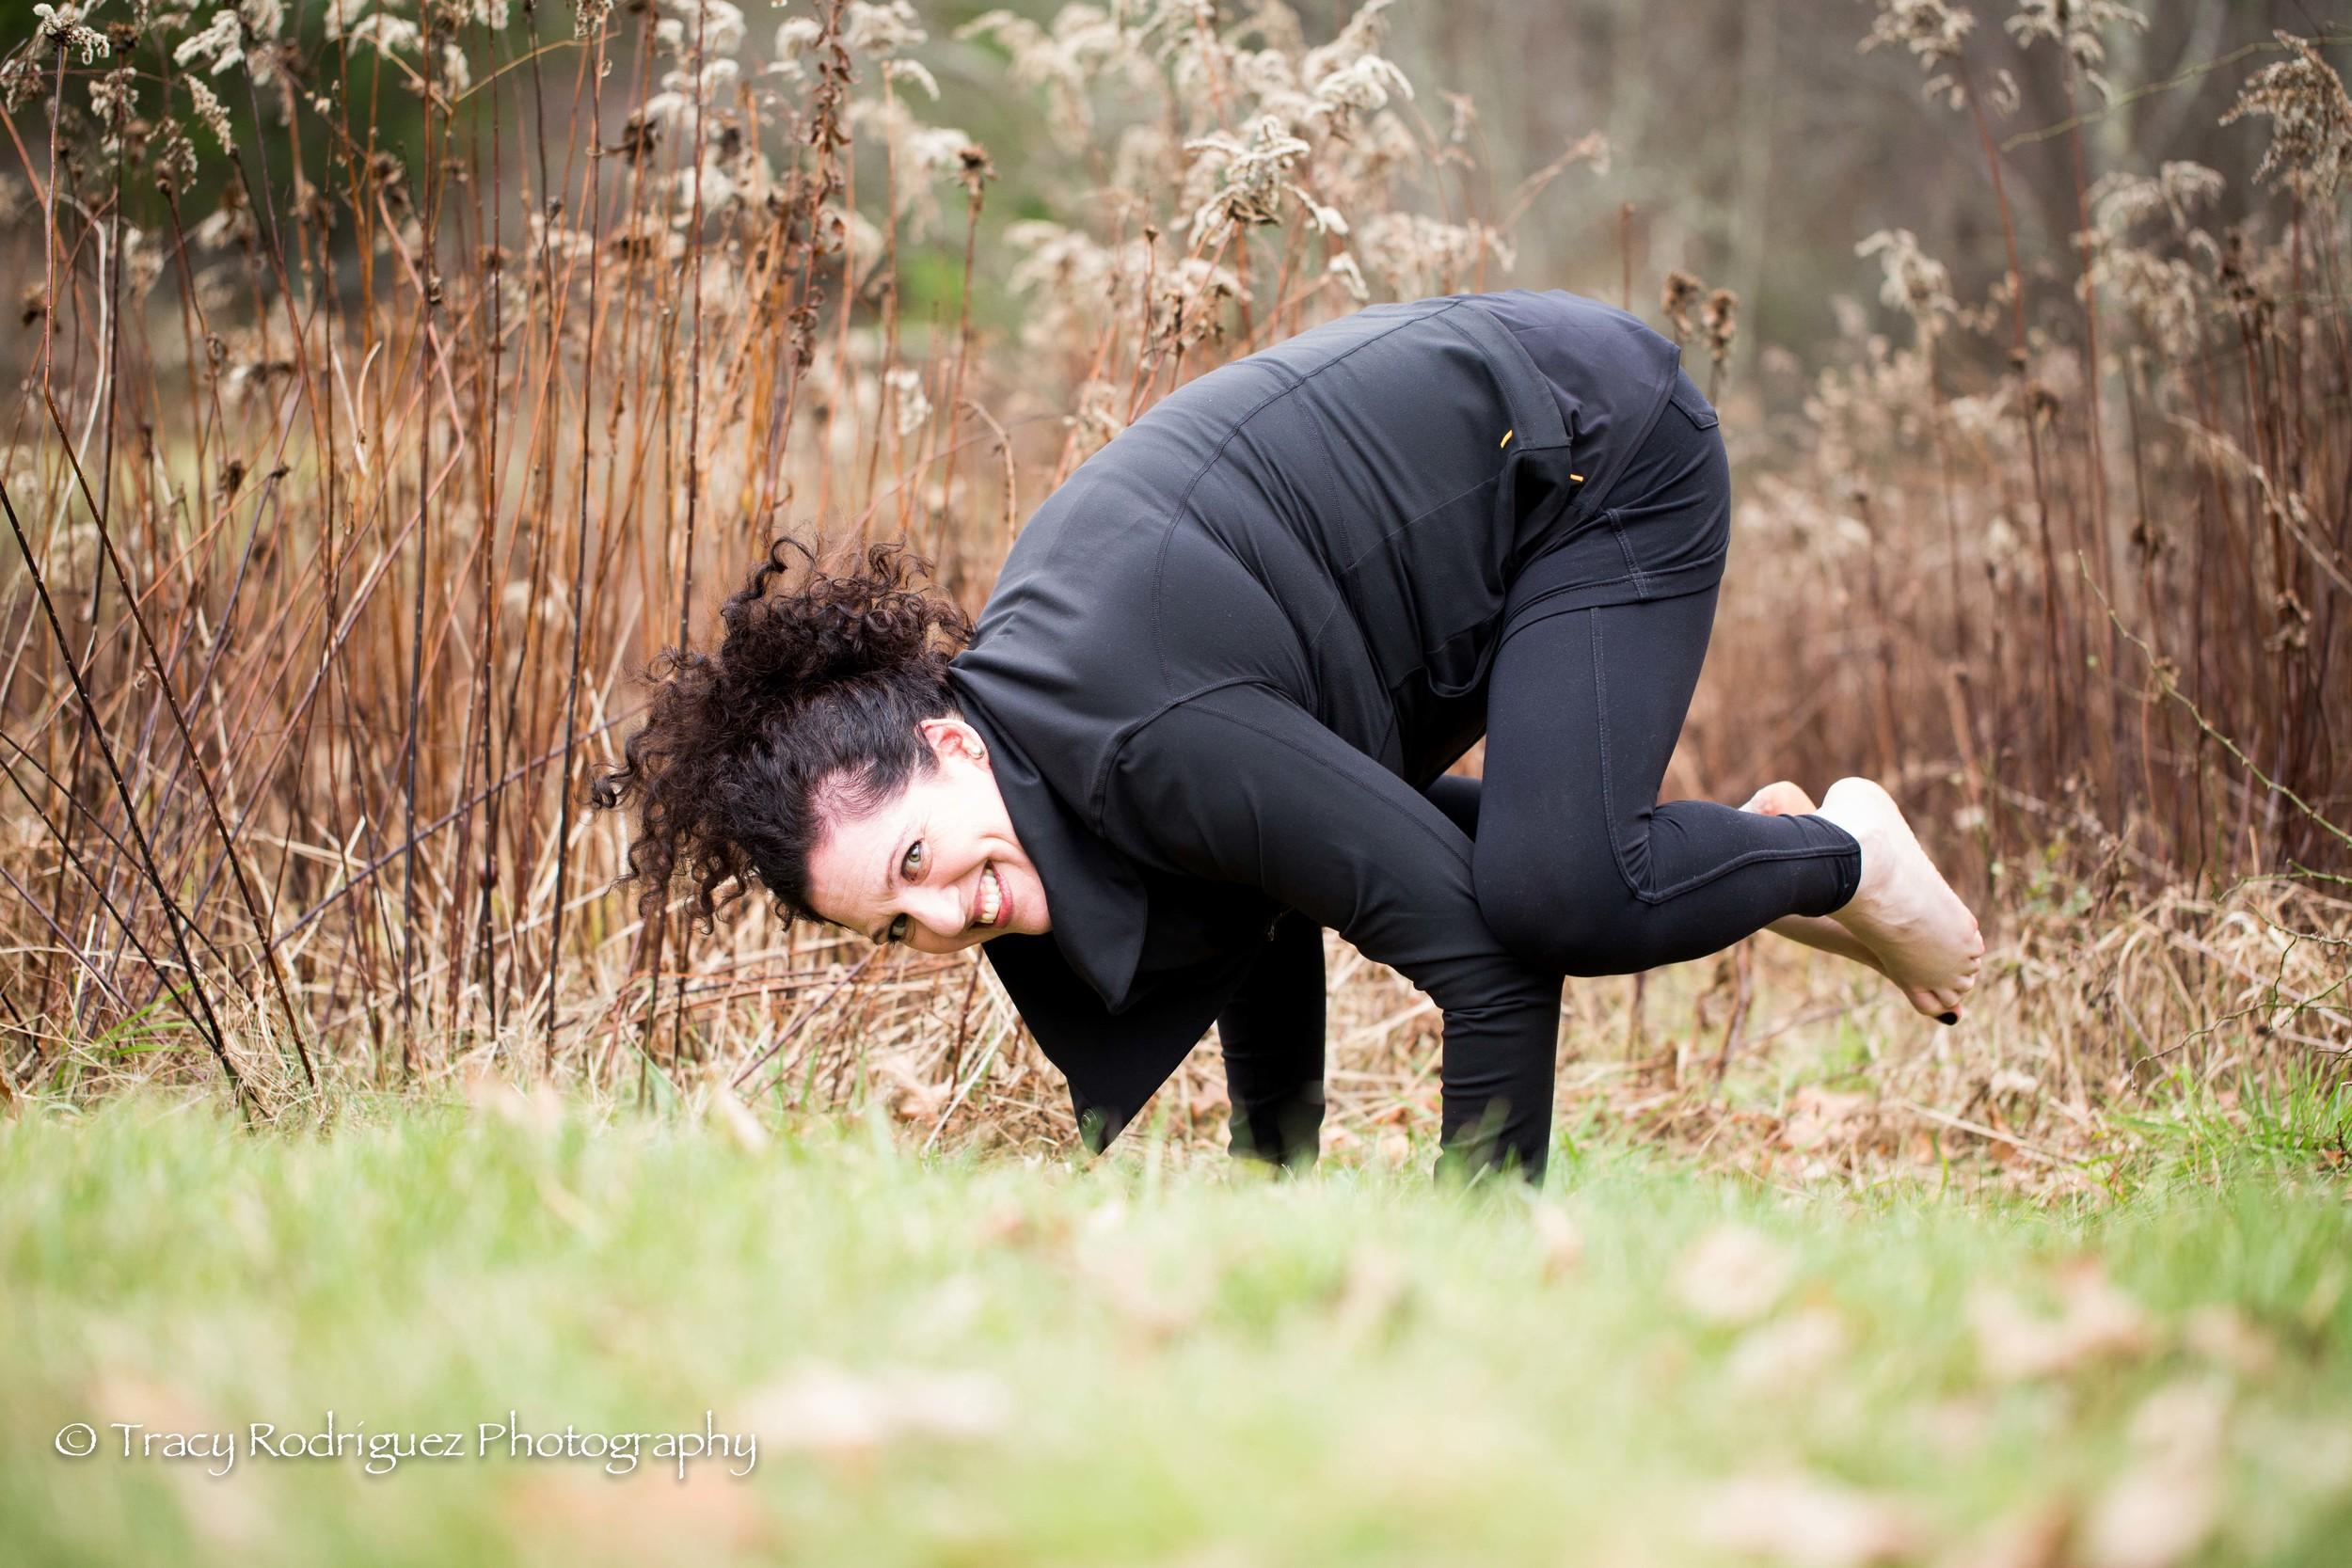 TracyRodriguezPhotography-Elyse-2720.jpg